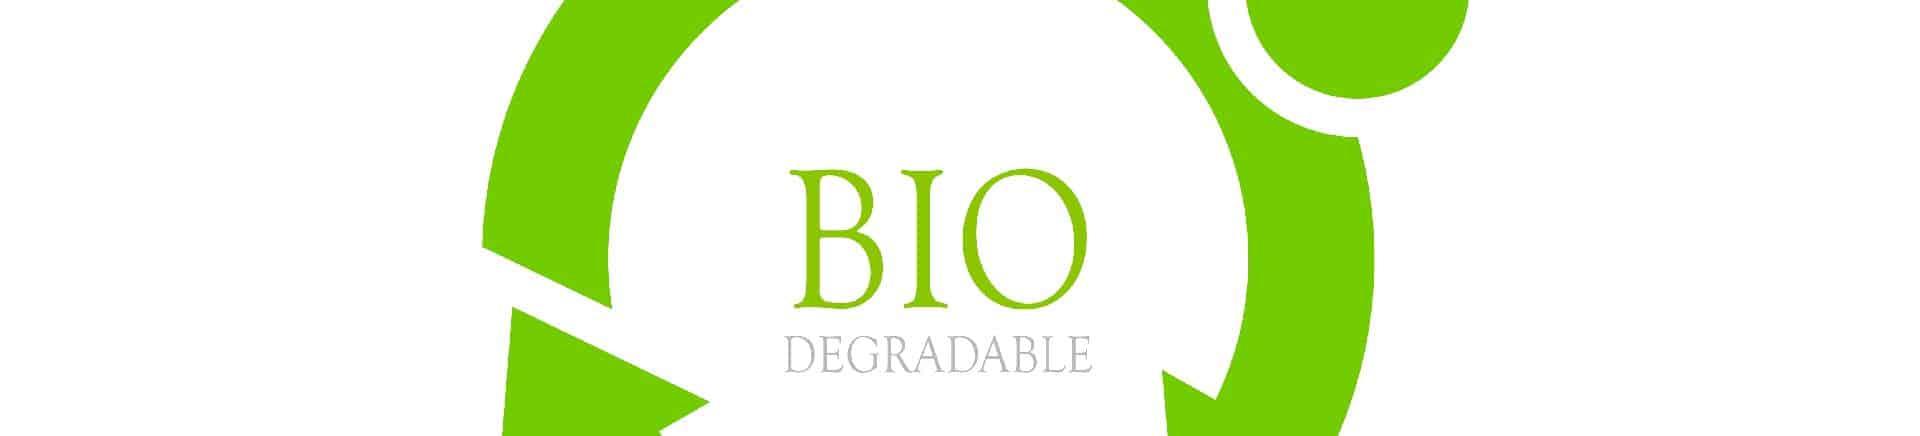 China biodegradable plastics